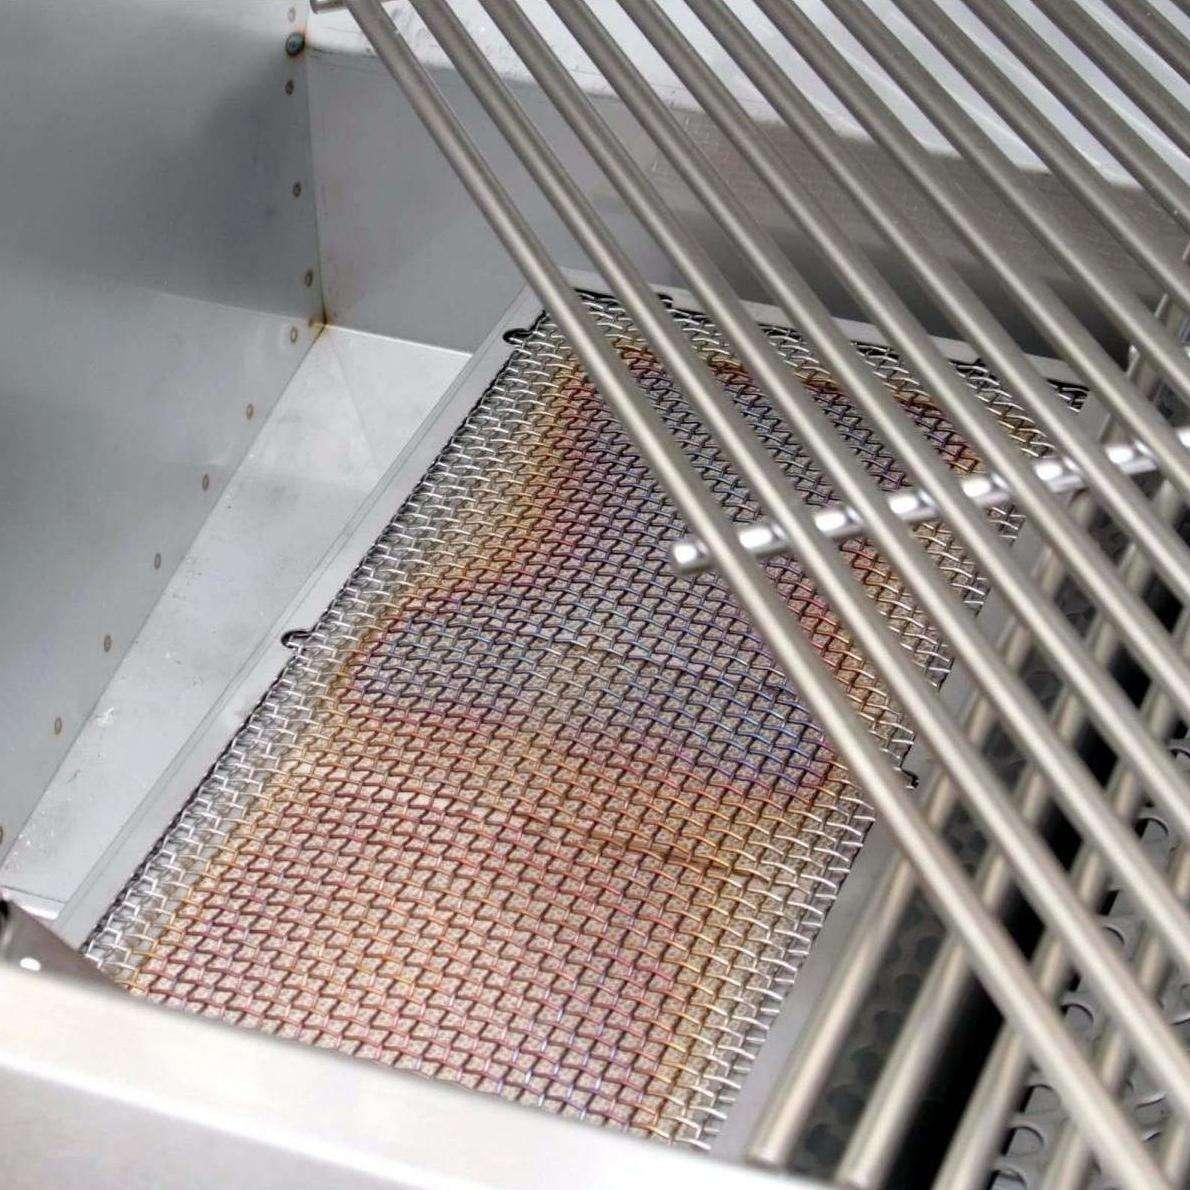 Fire Magic Echelon Diamond E660i Natural Gas Grill on Cart - Infrared Burner